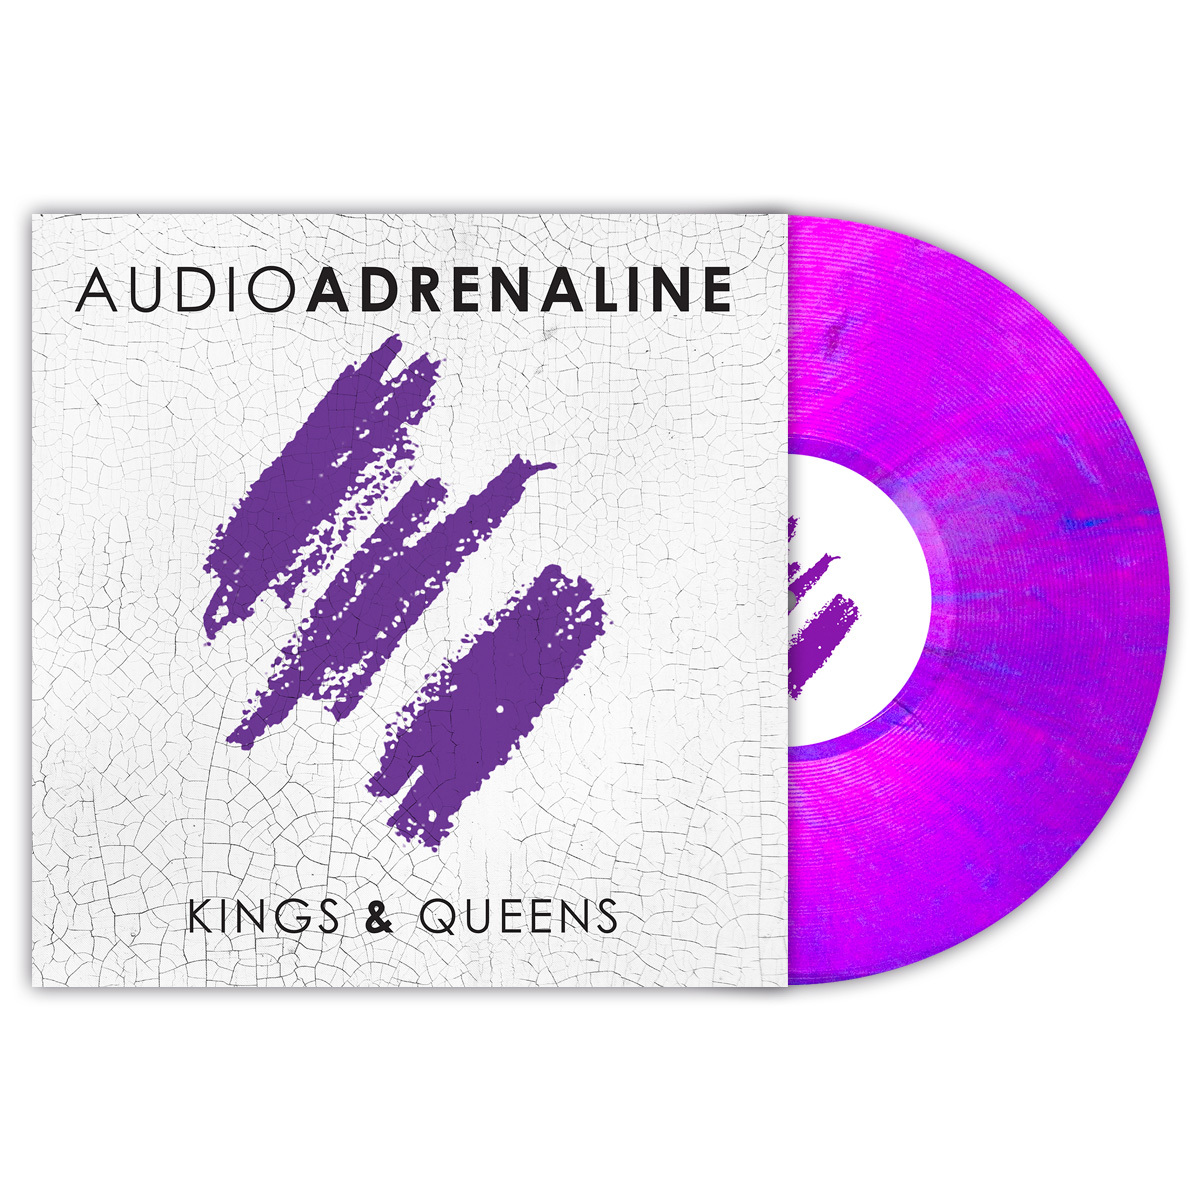 Kings & Queens Limited Edition Transparent Purple Vinyl